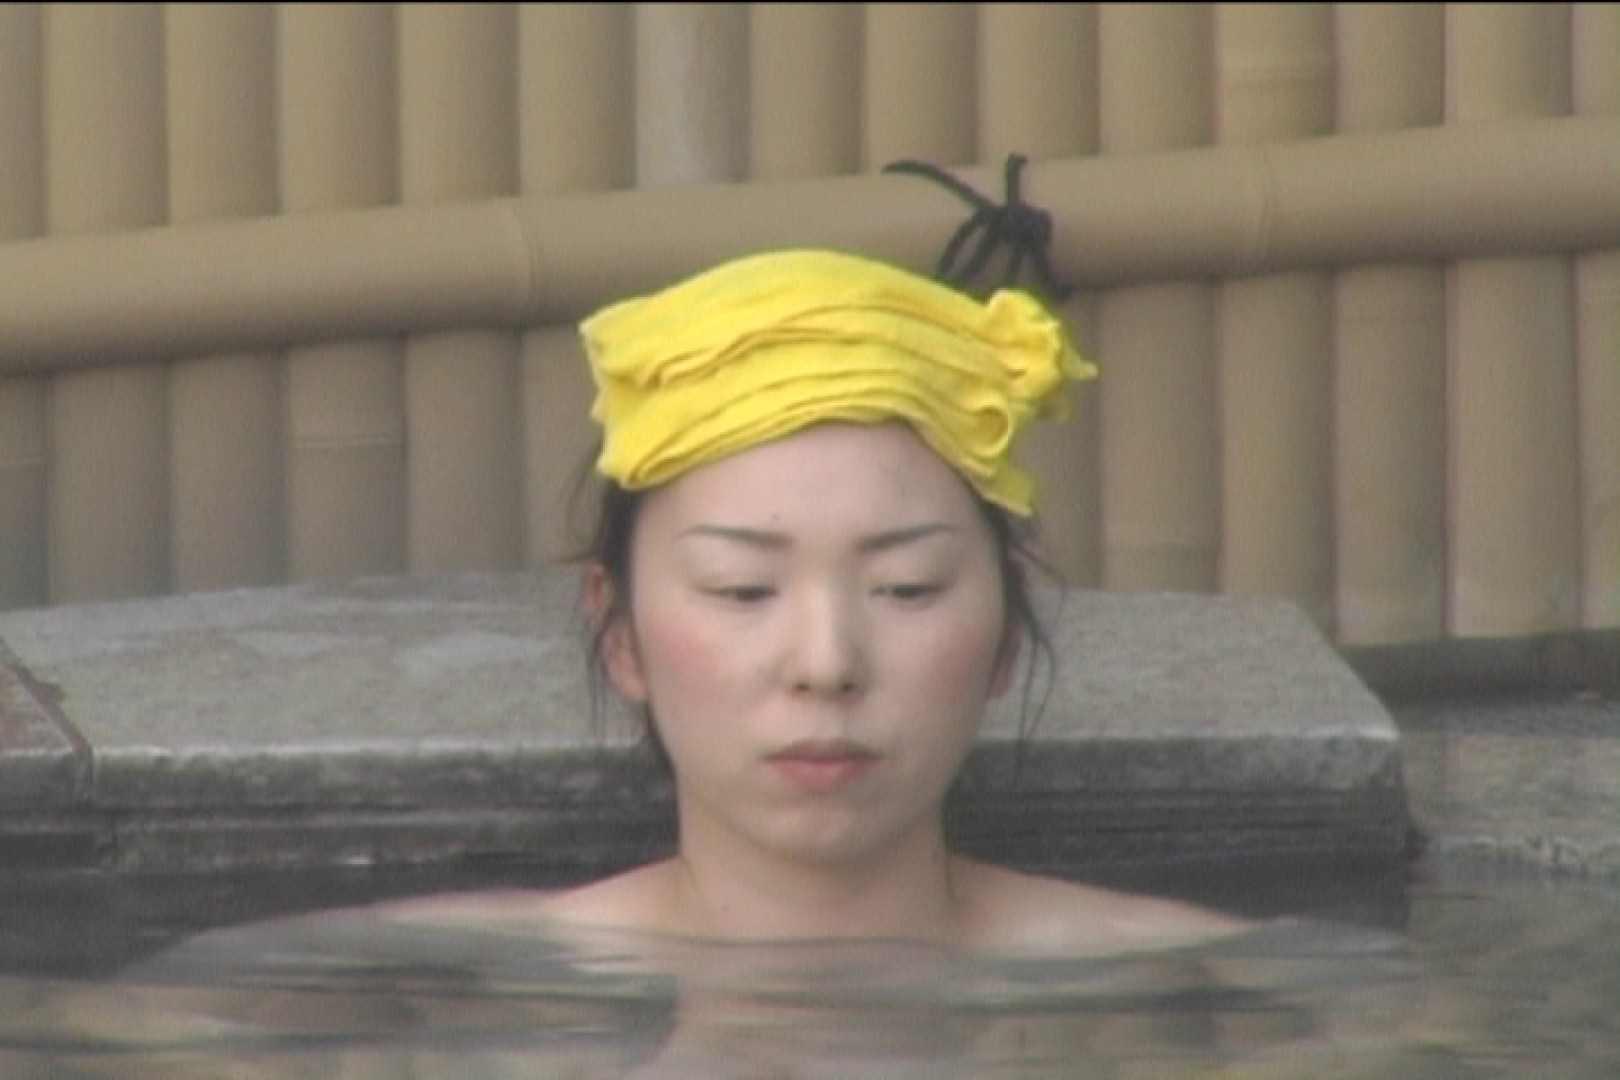 Aquaな露天風呂Vol.529 盗撮映像  51Pix 18